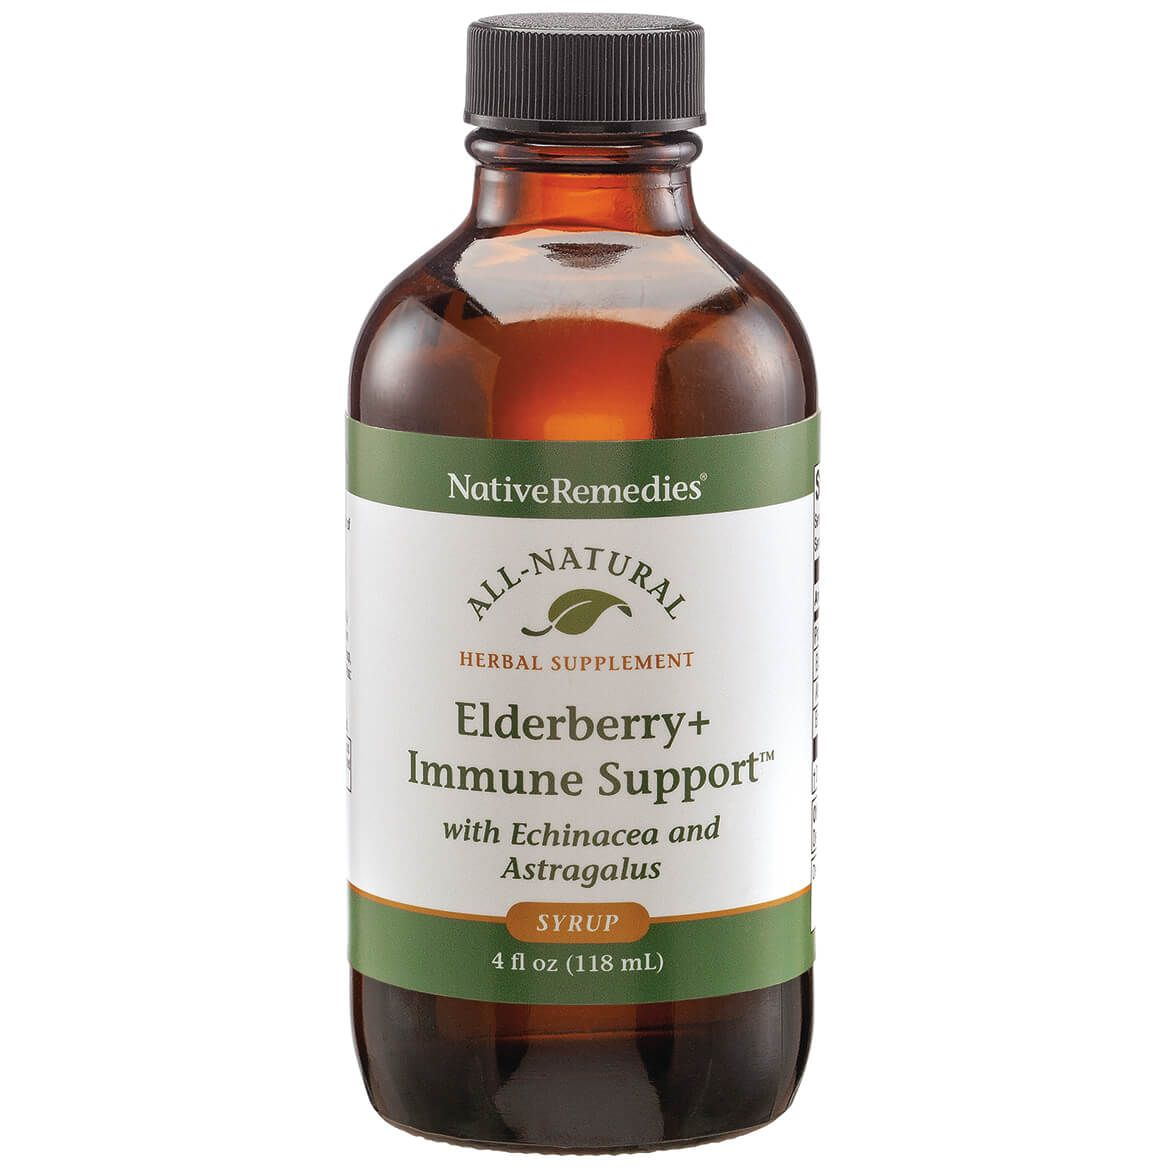 Elderberry+ Immune Support-370984